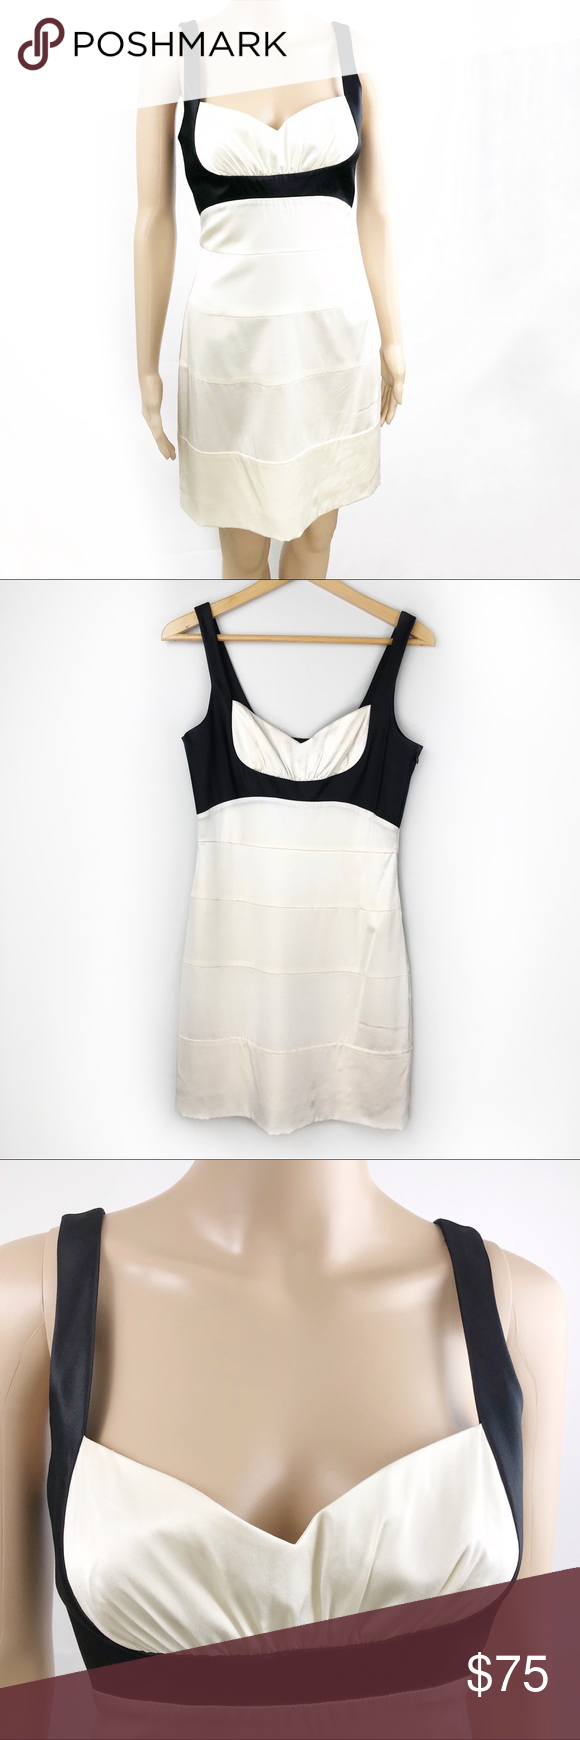 Bcbg Maxazria Silk Bandage Cocktail Dress Size 8 Clothes Design Bcbg Dresses [ 1740 x 580 Pixel ]